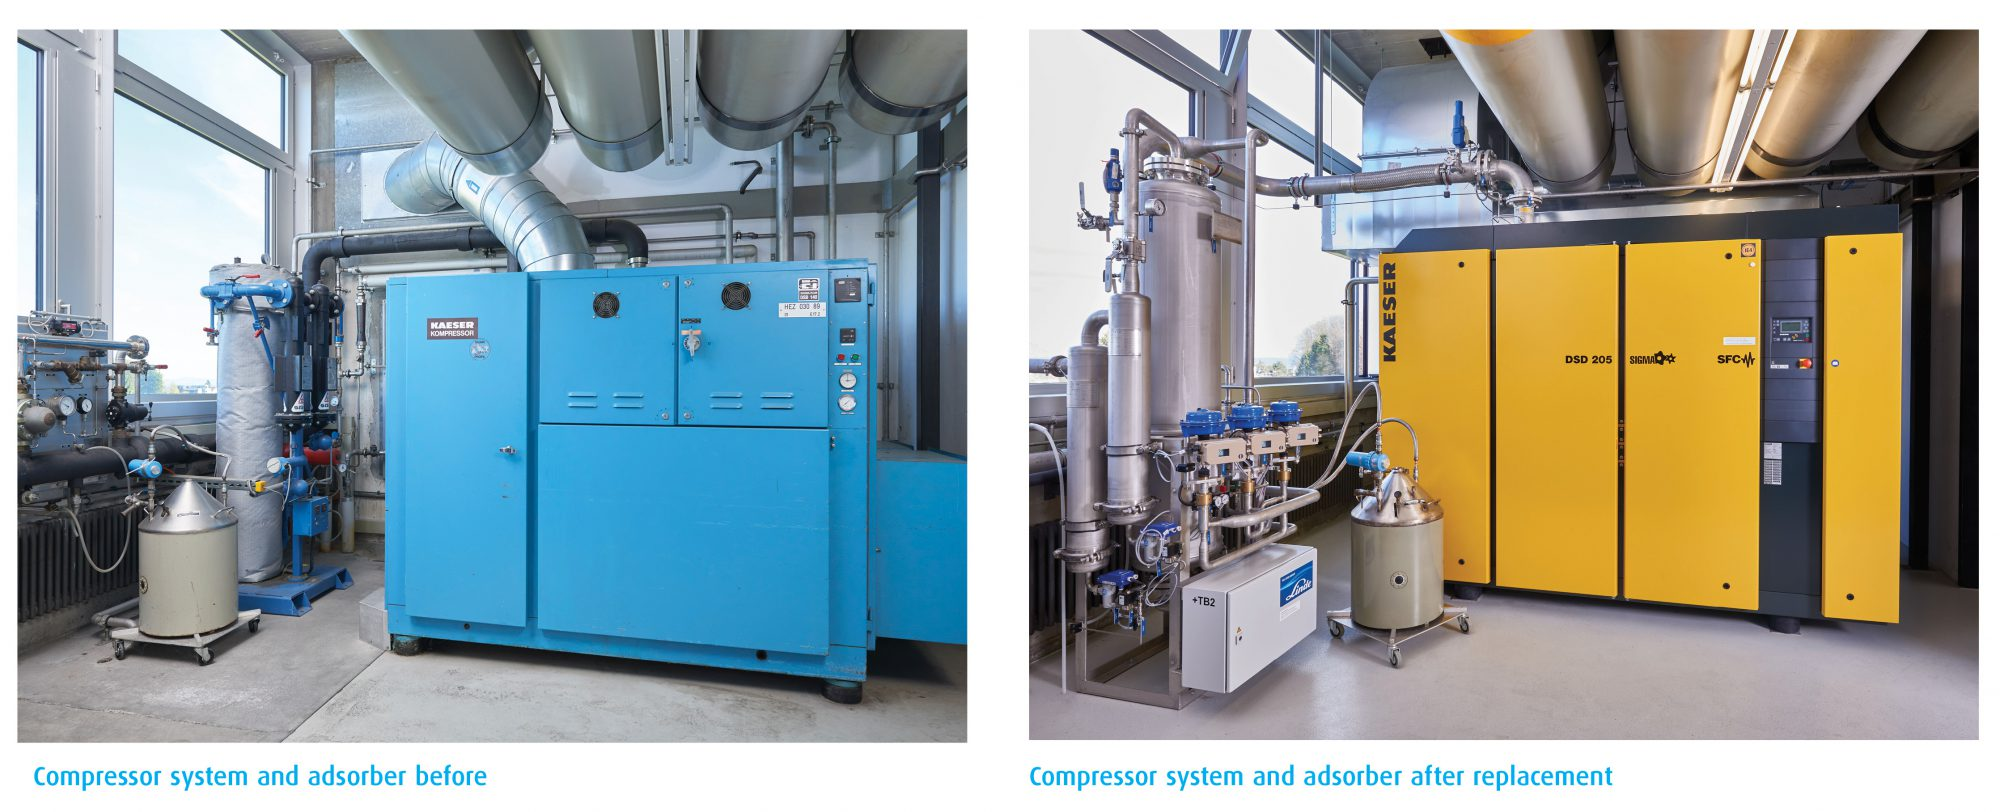 Compressor and adsorber